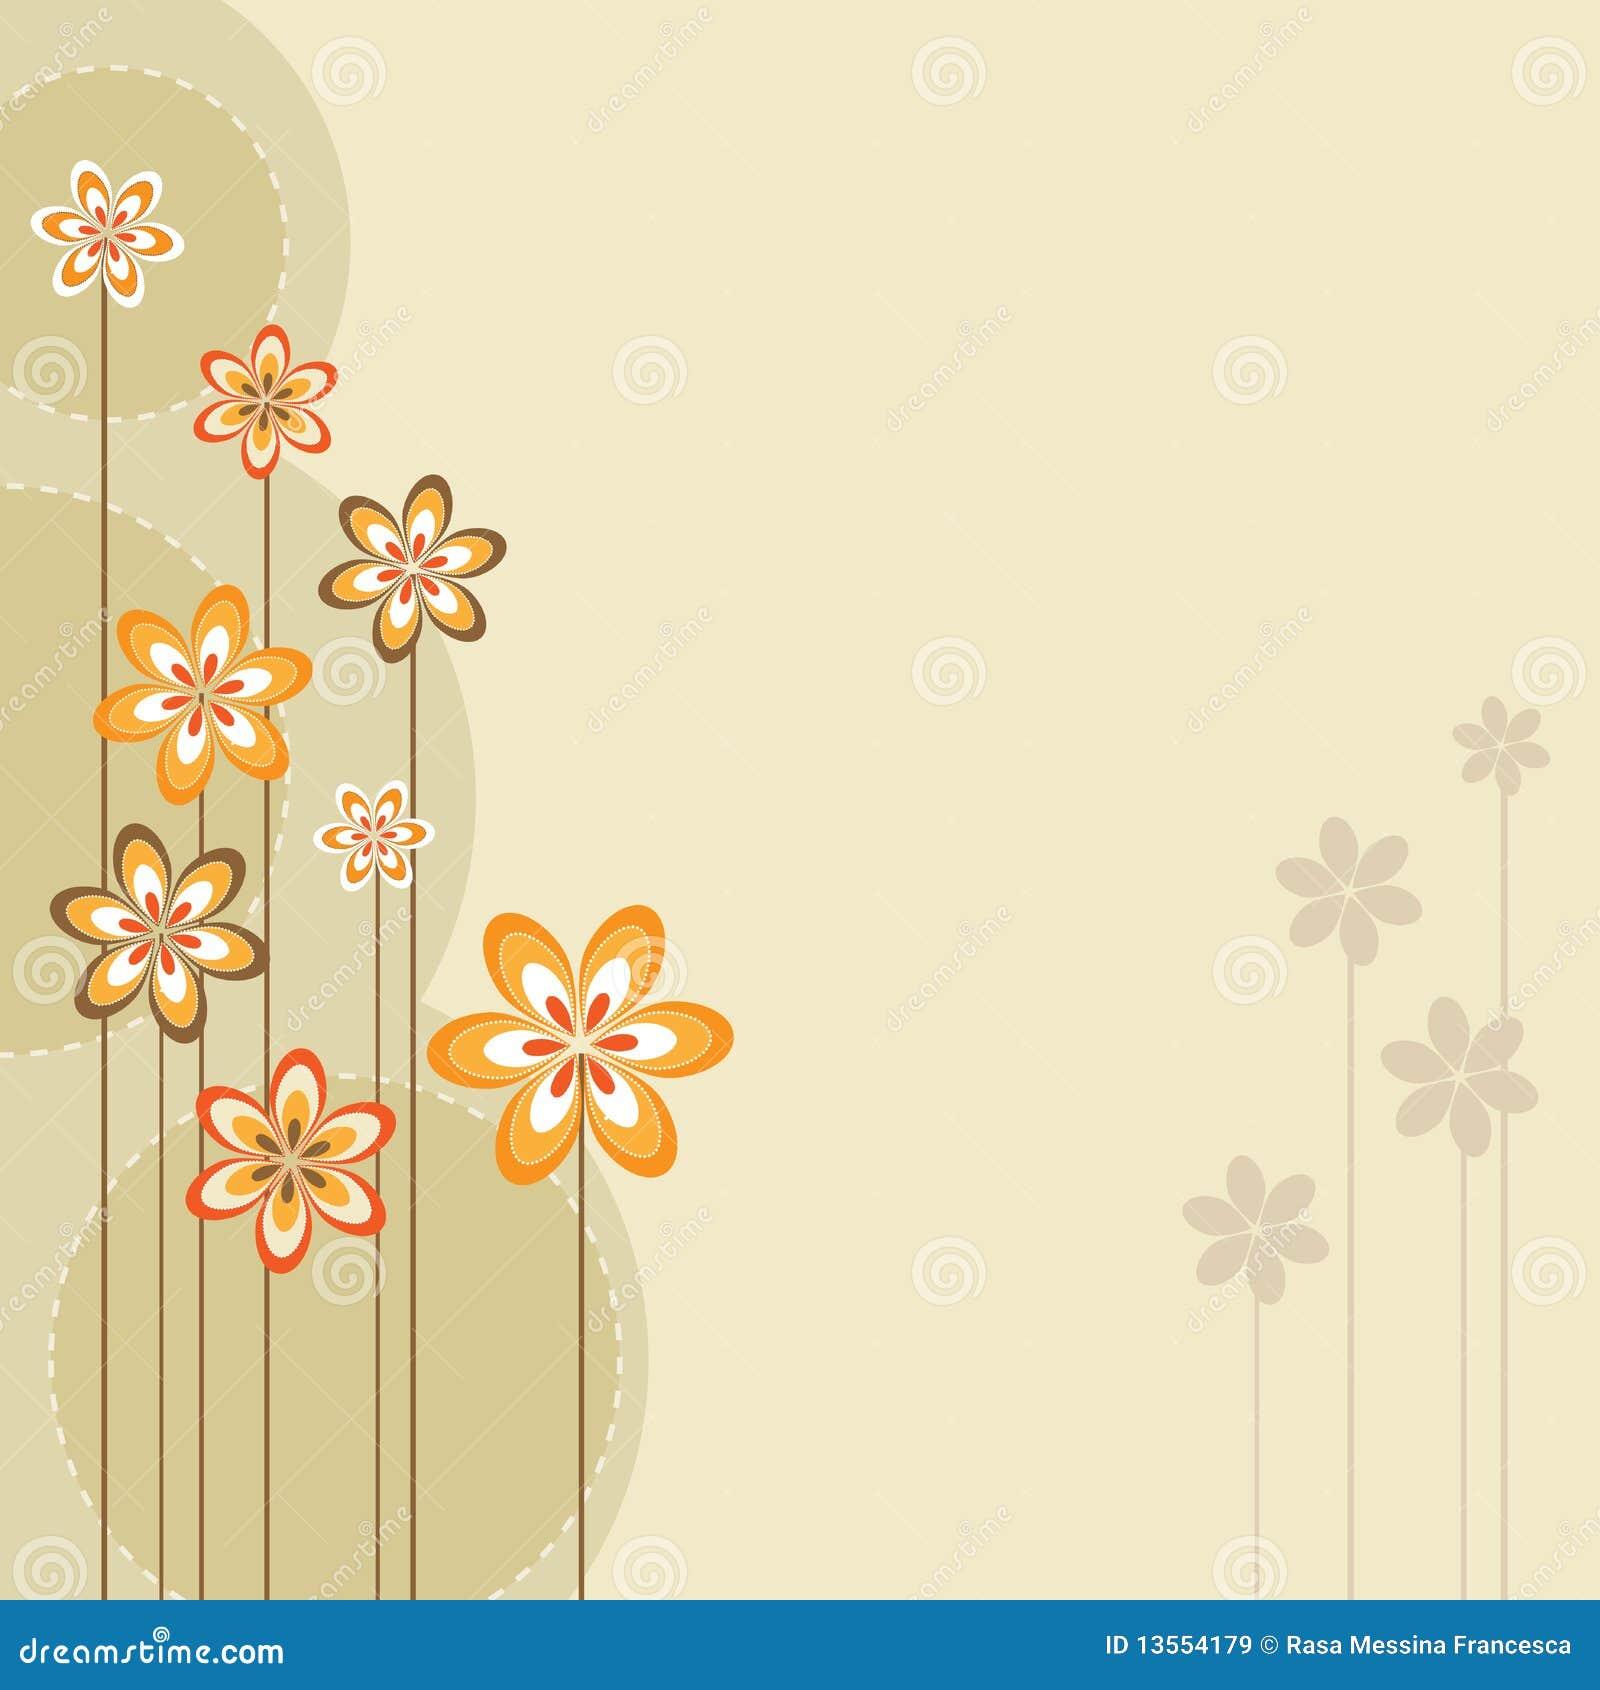 Retro spring design